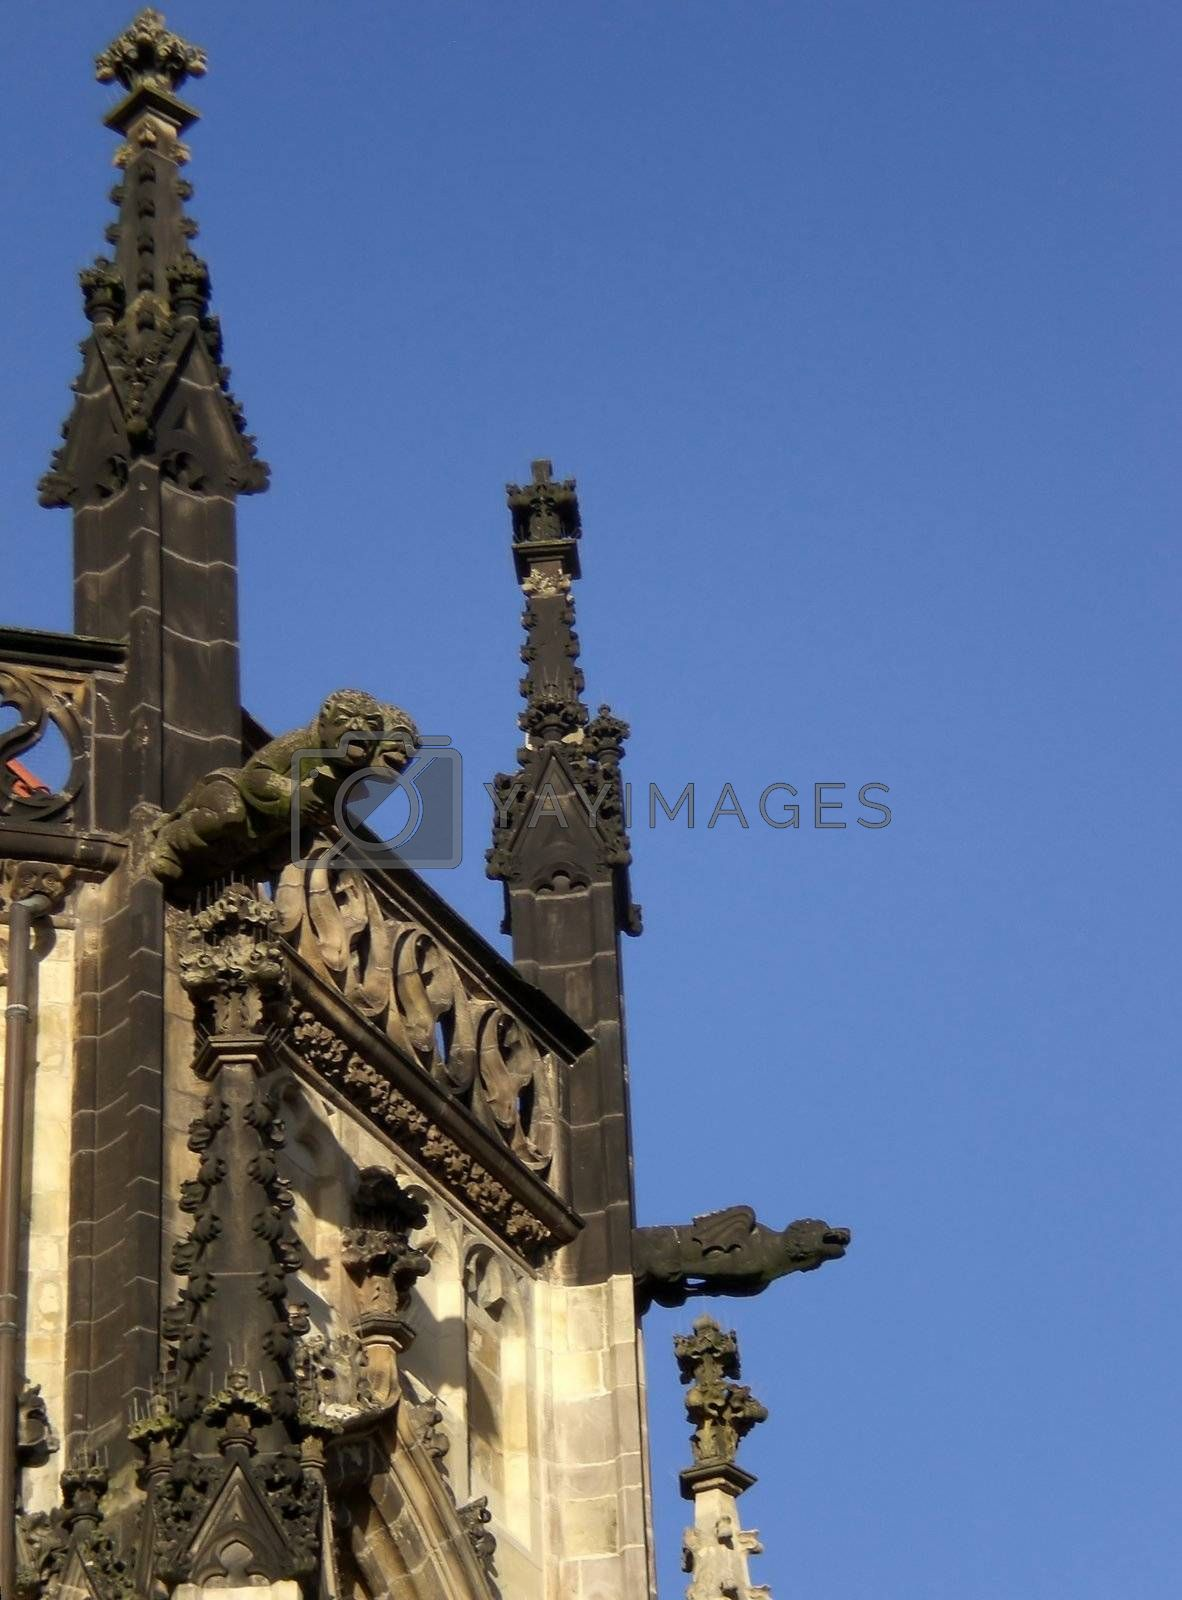 Gargoyles at a gothic church roof